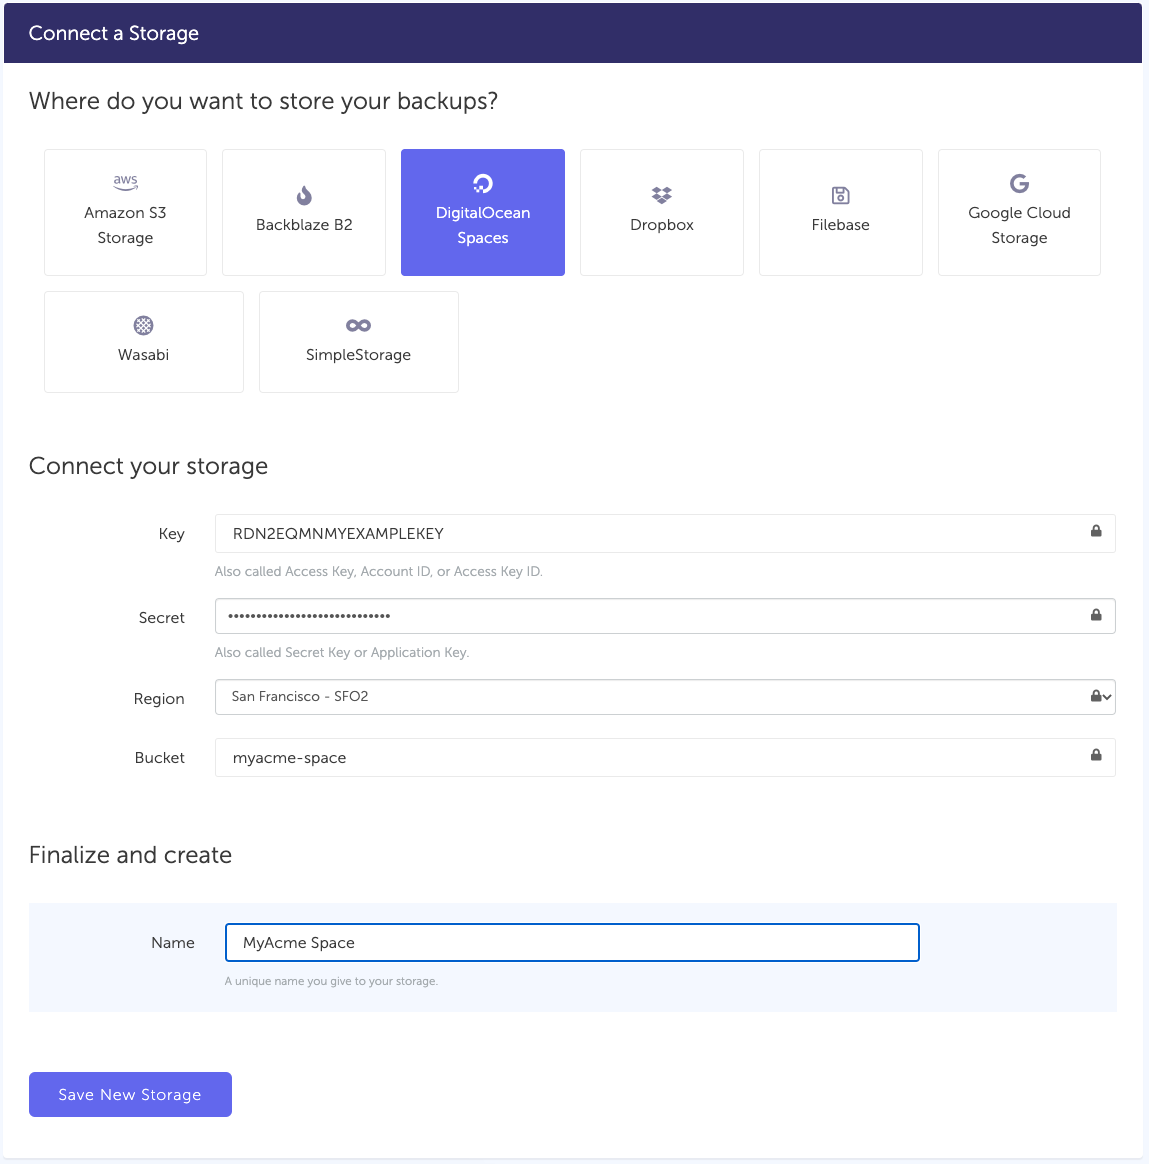 DigitalOcean Spaces backup - Connect storage